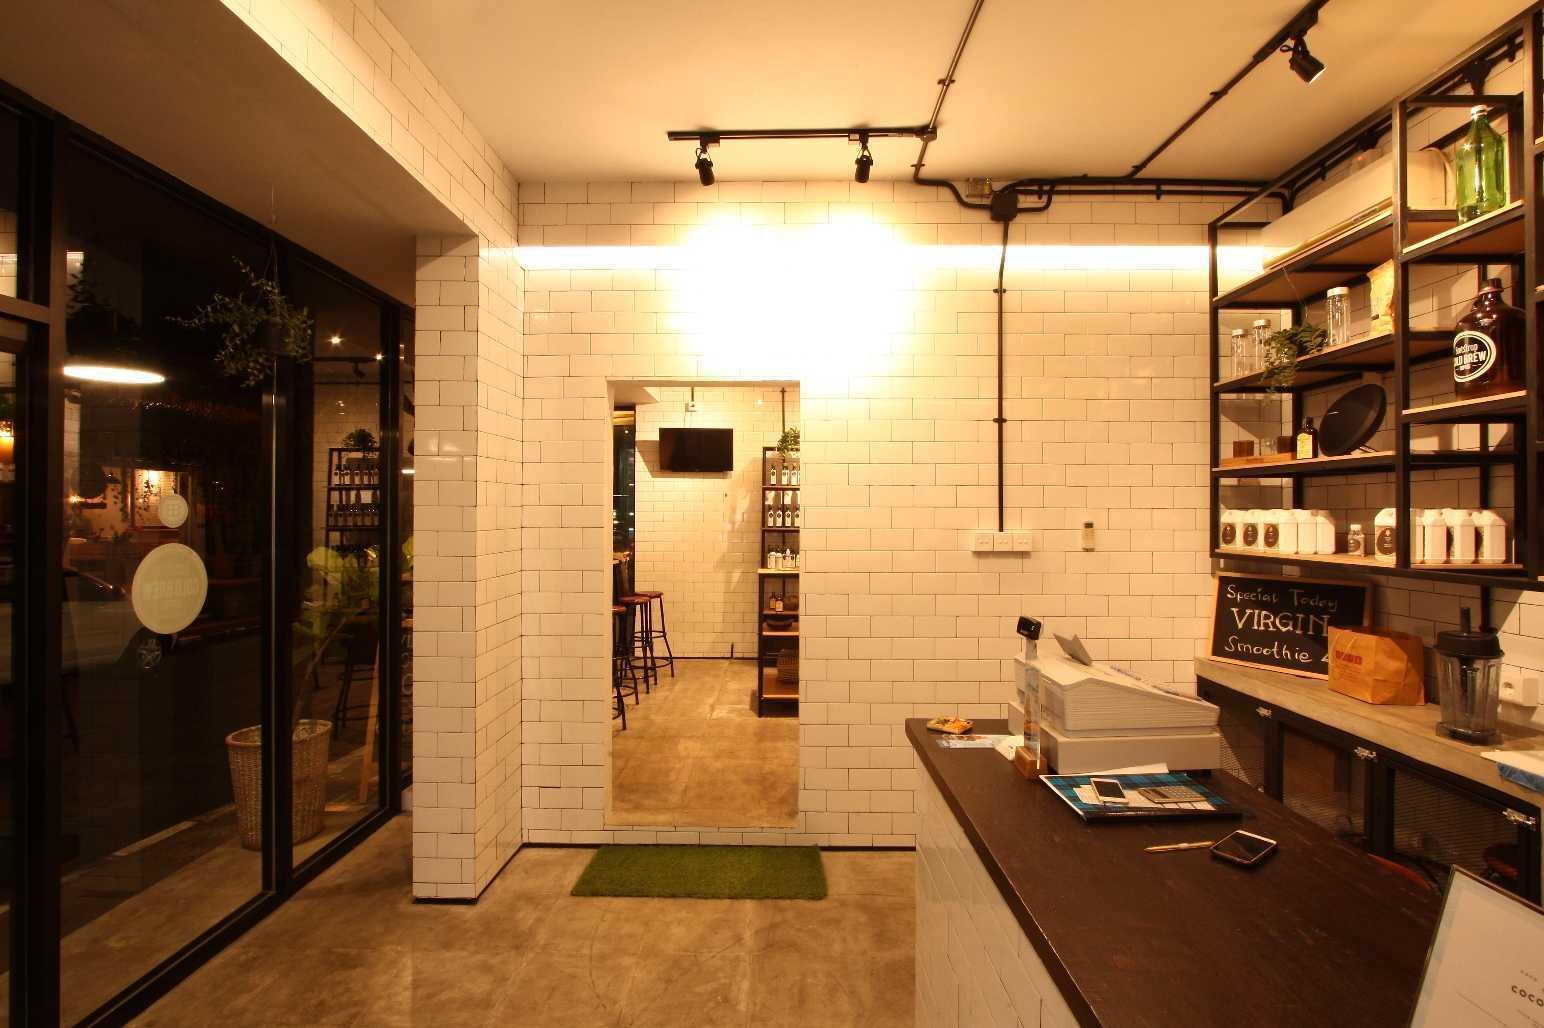 Ddap Architect Coconut Warung Shop & Cafe Ubud, Kabupaten Gianyar, Bali, Indonesia Bali Img0872 Industrial  28548